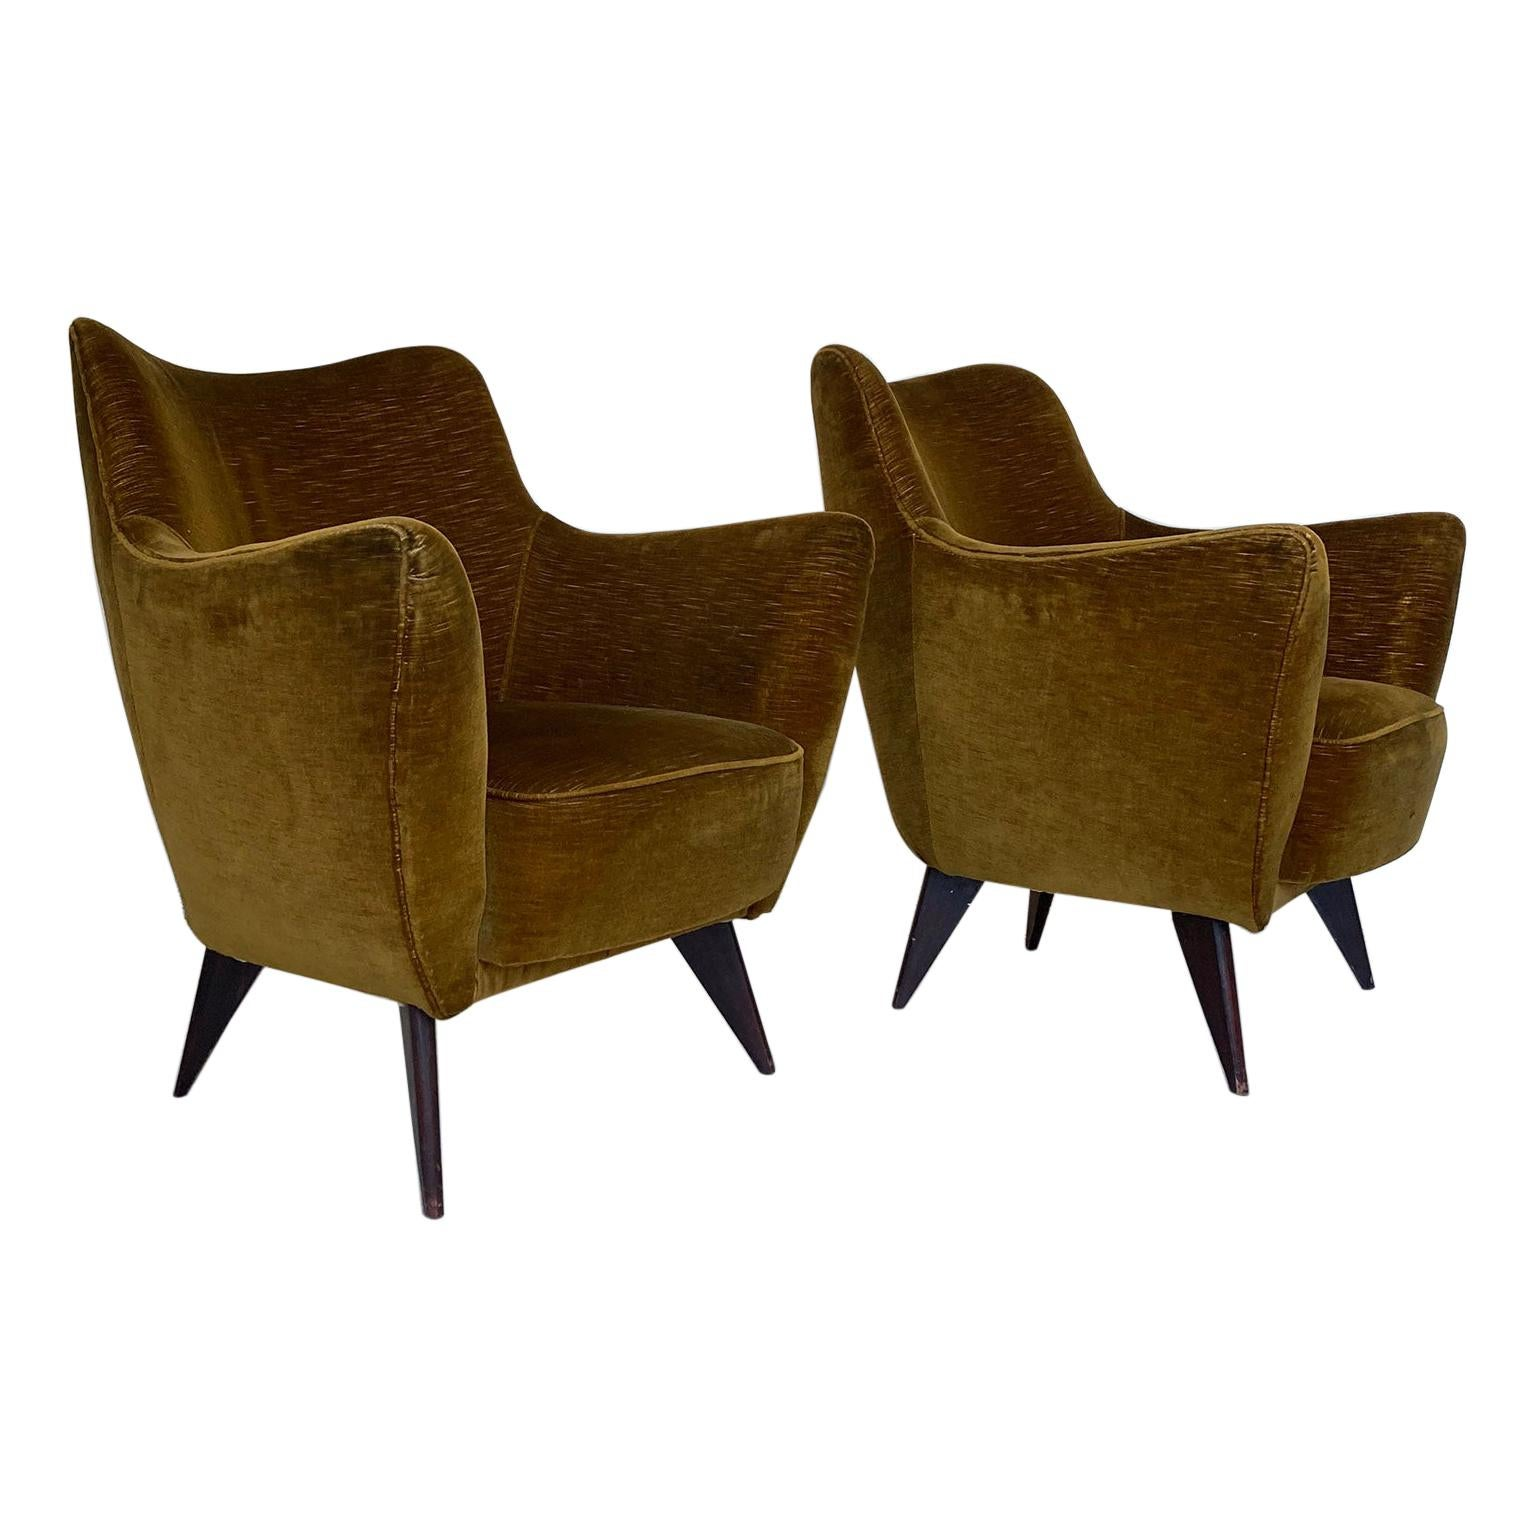 Mid Century Pair of Velvet 'PERLA' Armchairs by G. Veronesi for ISA, Italy 1950s